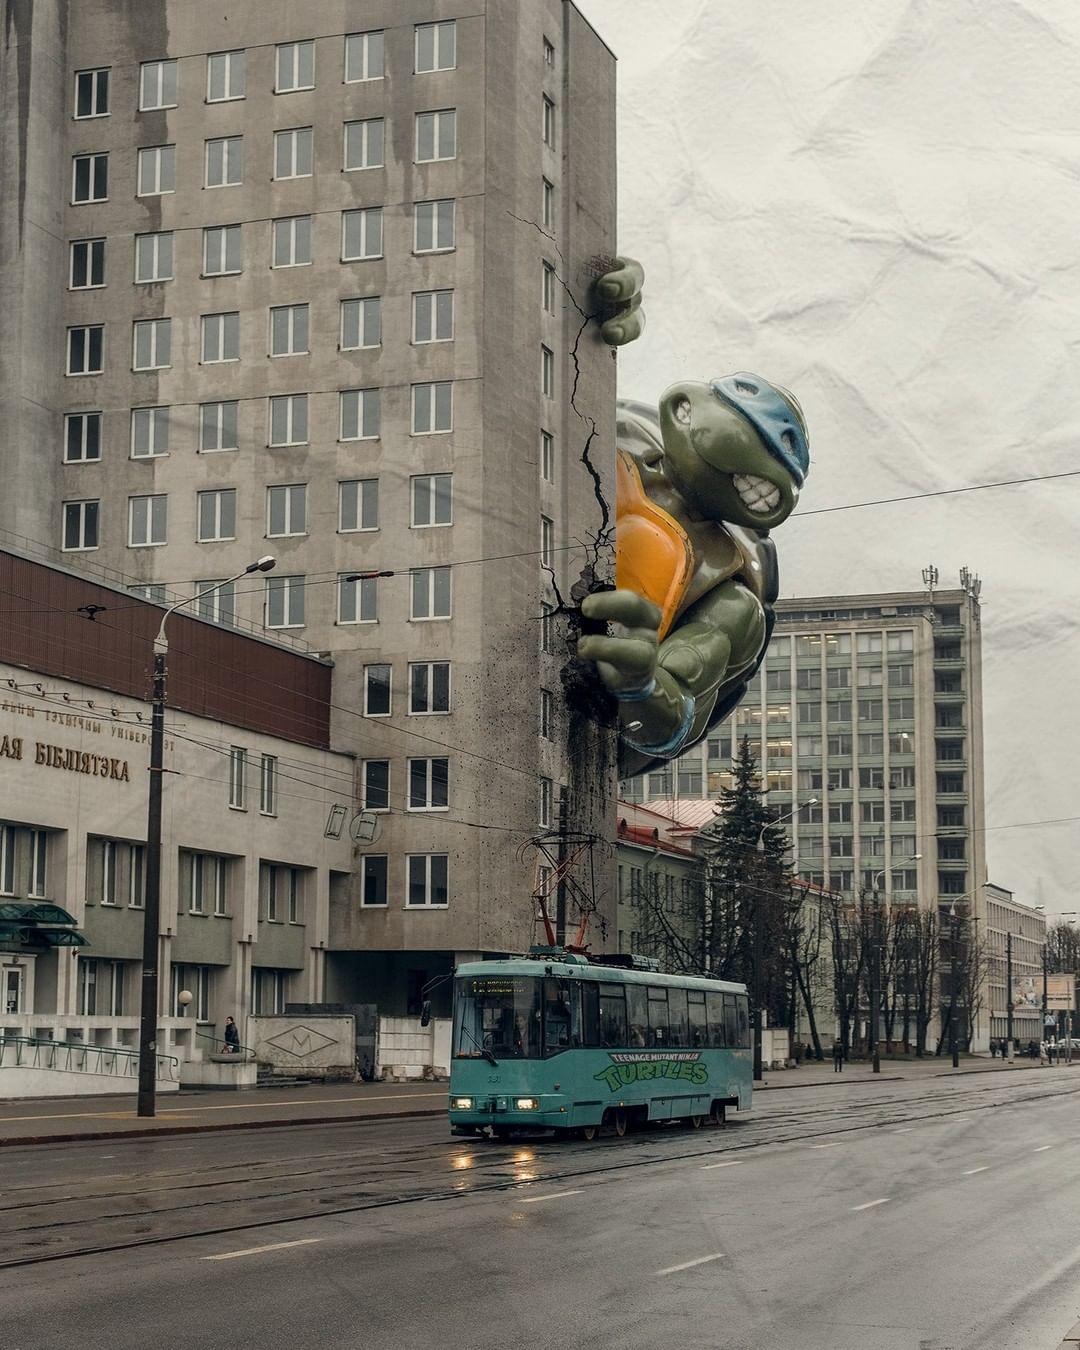 Giant Ninja Turtle Takes Over Minsk: Huge Leonardo Is Exploring the World of Soviet Architecture